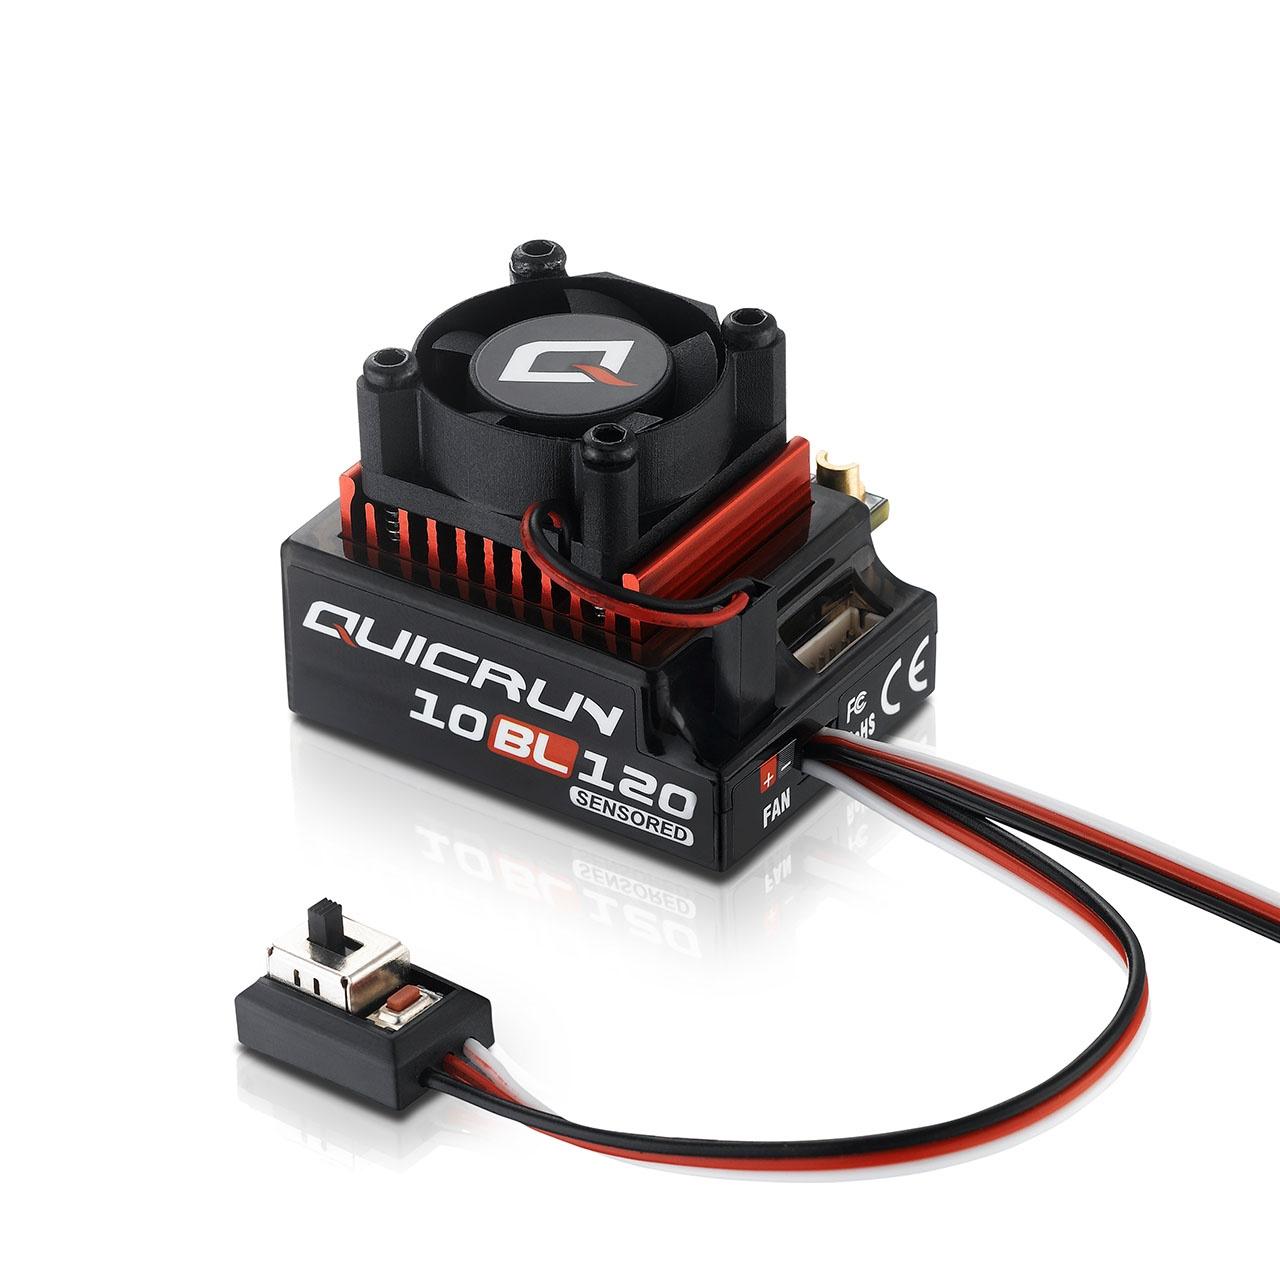 QuicRun 10BL120 120A Sensored Regler